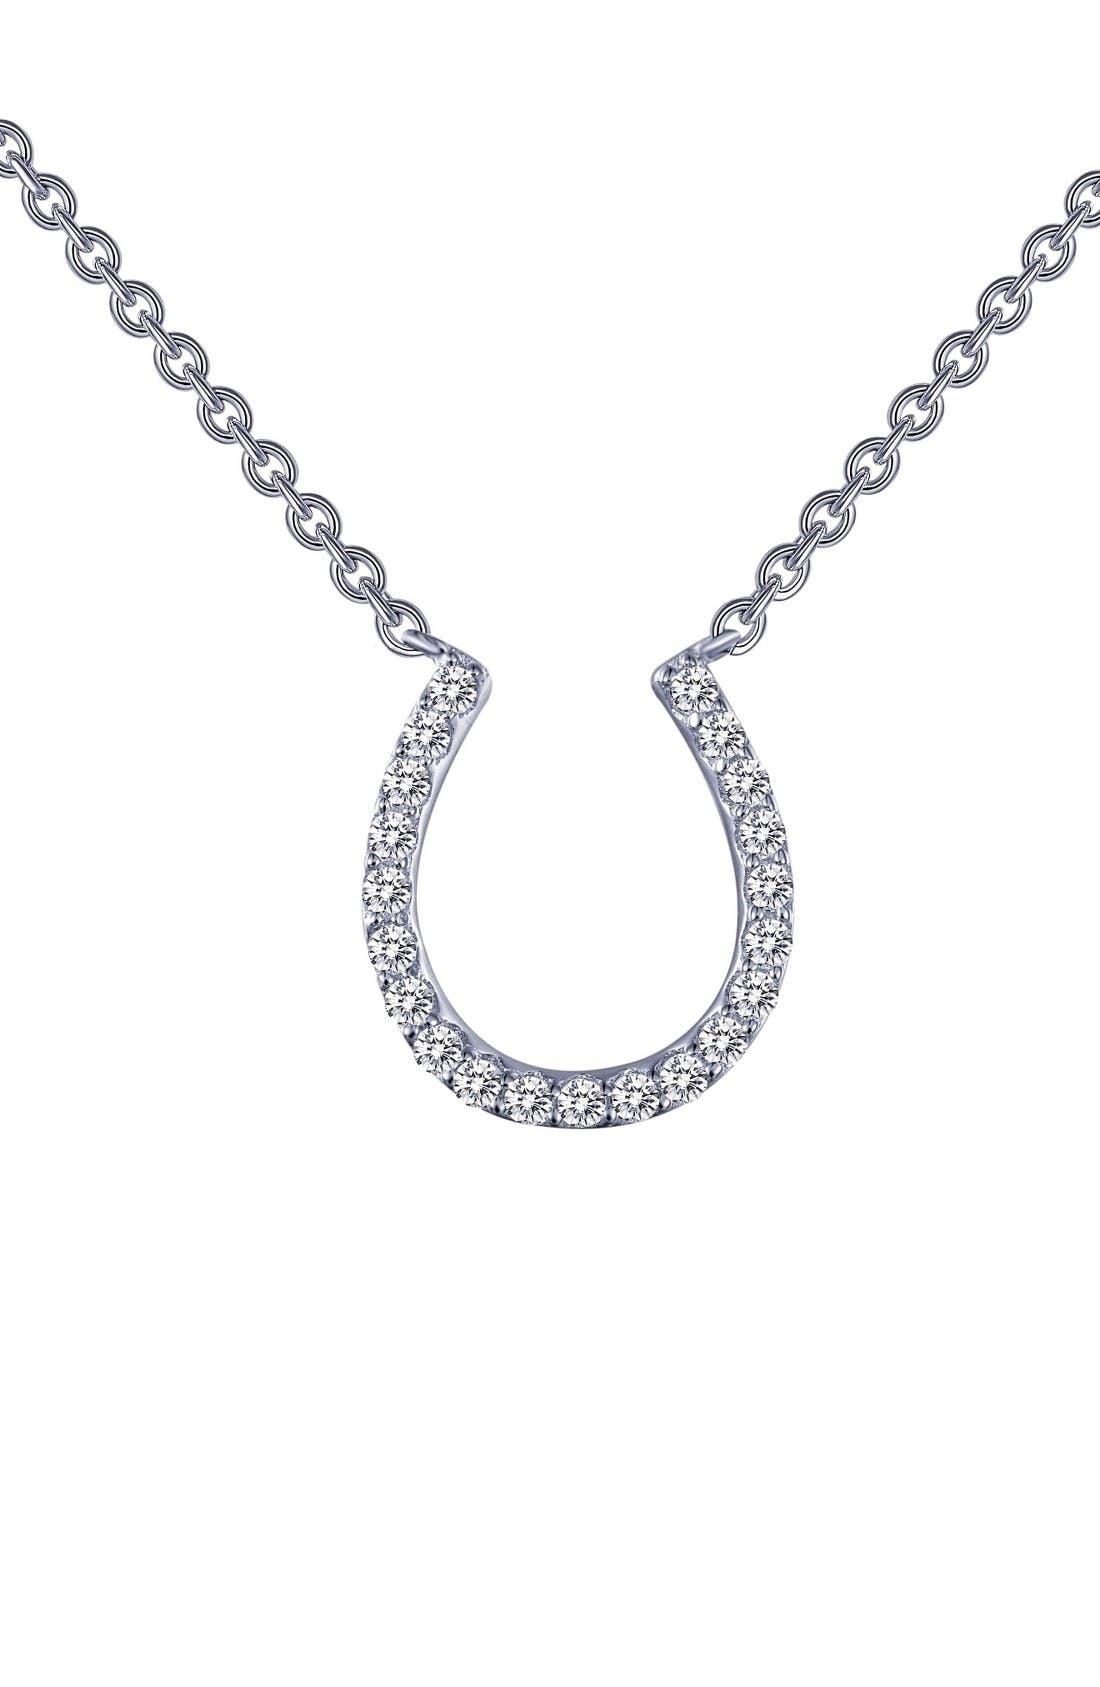 Alternate Image 1 Selected - Lafonn Horseshoe Simulated Diamond Pendant Necklace